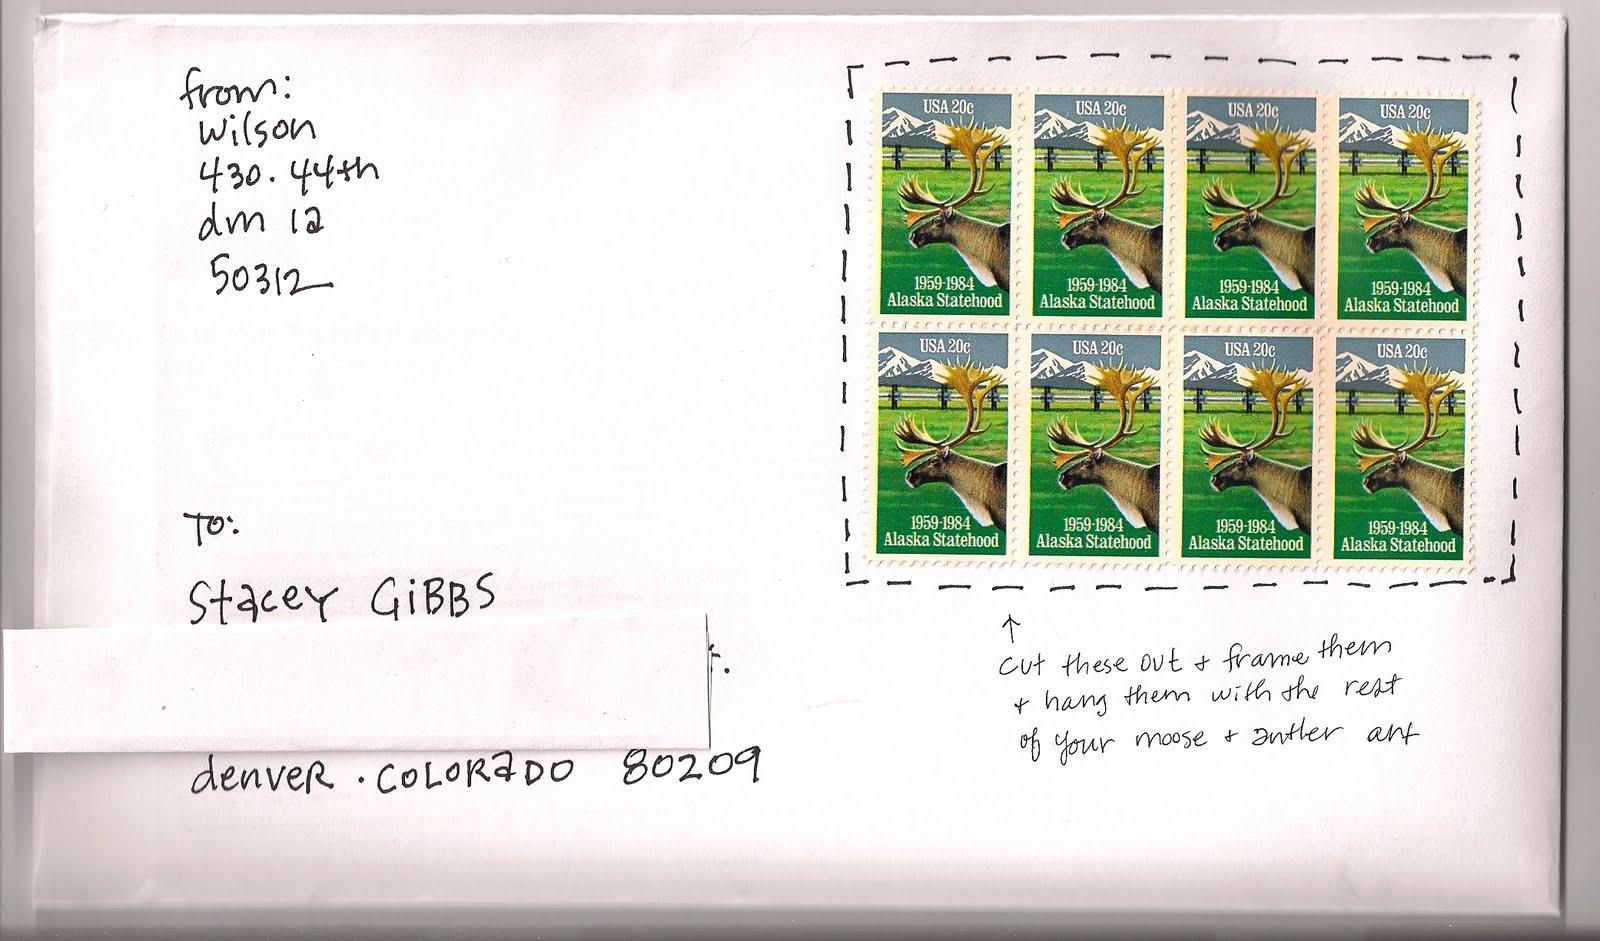 Pushing The Envelopes July 2011